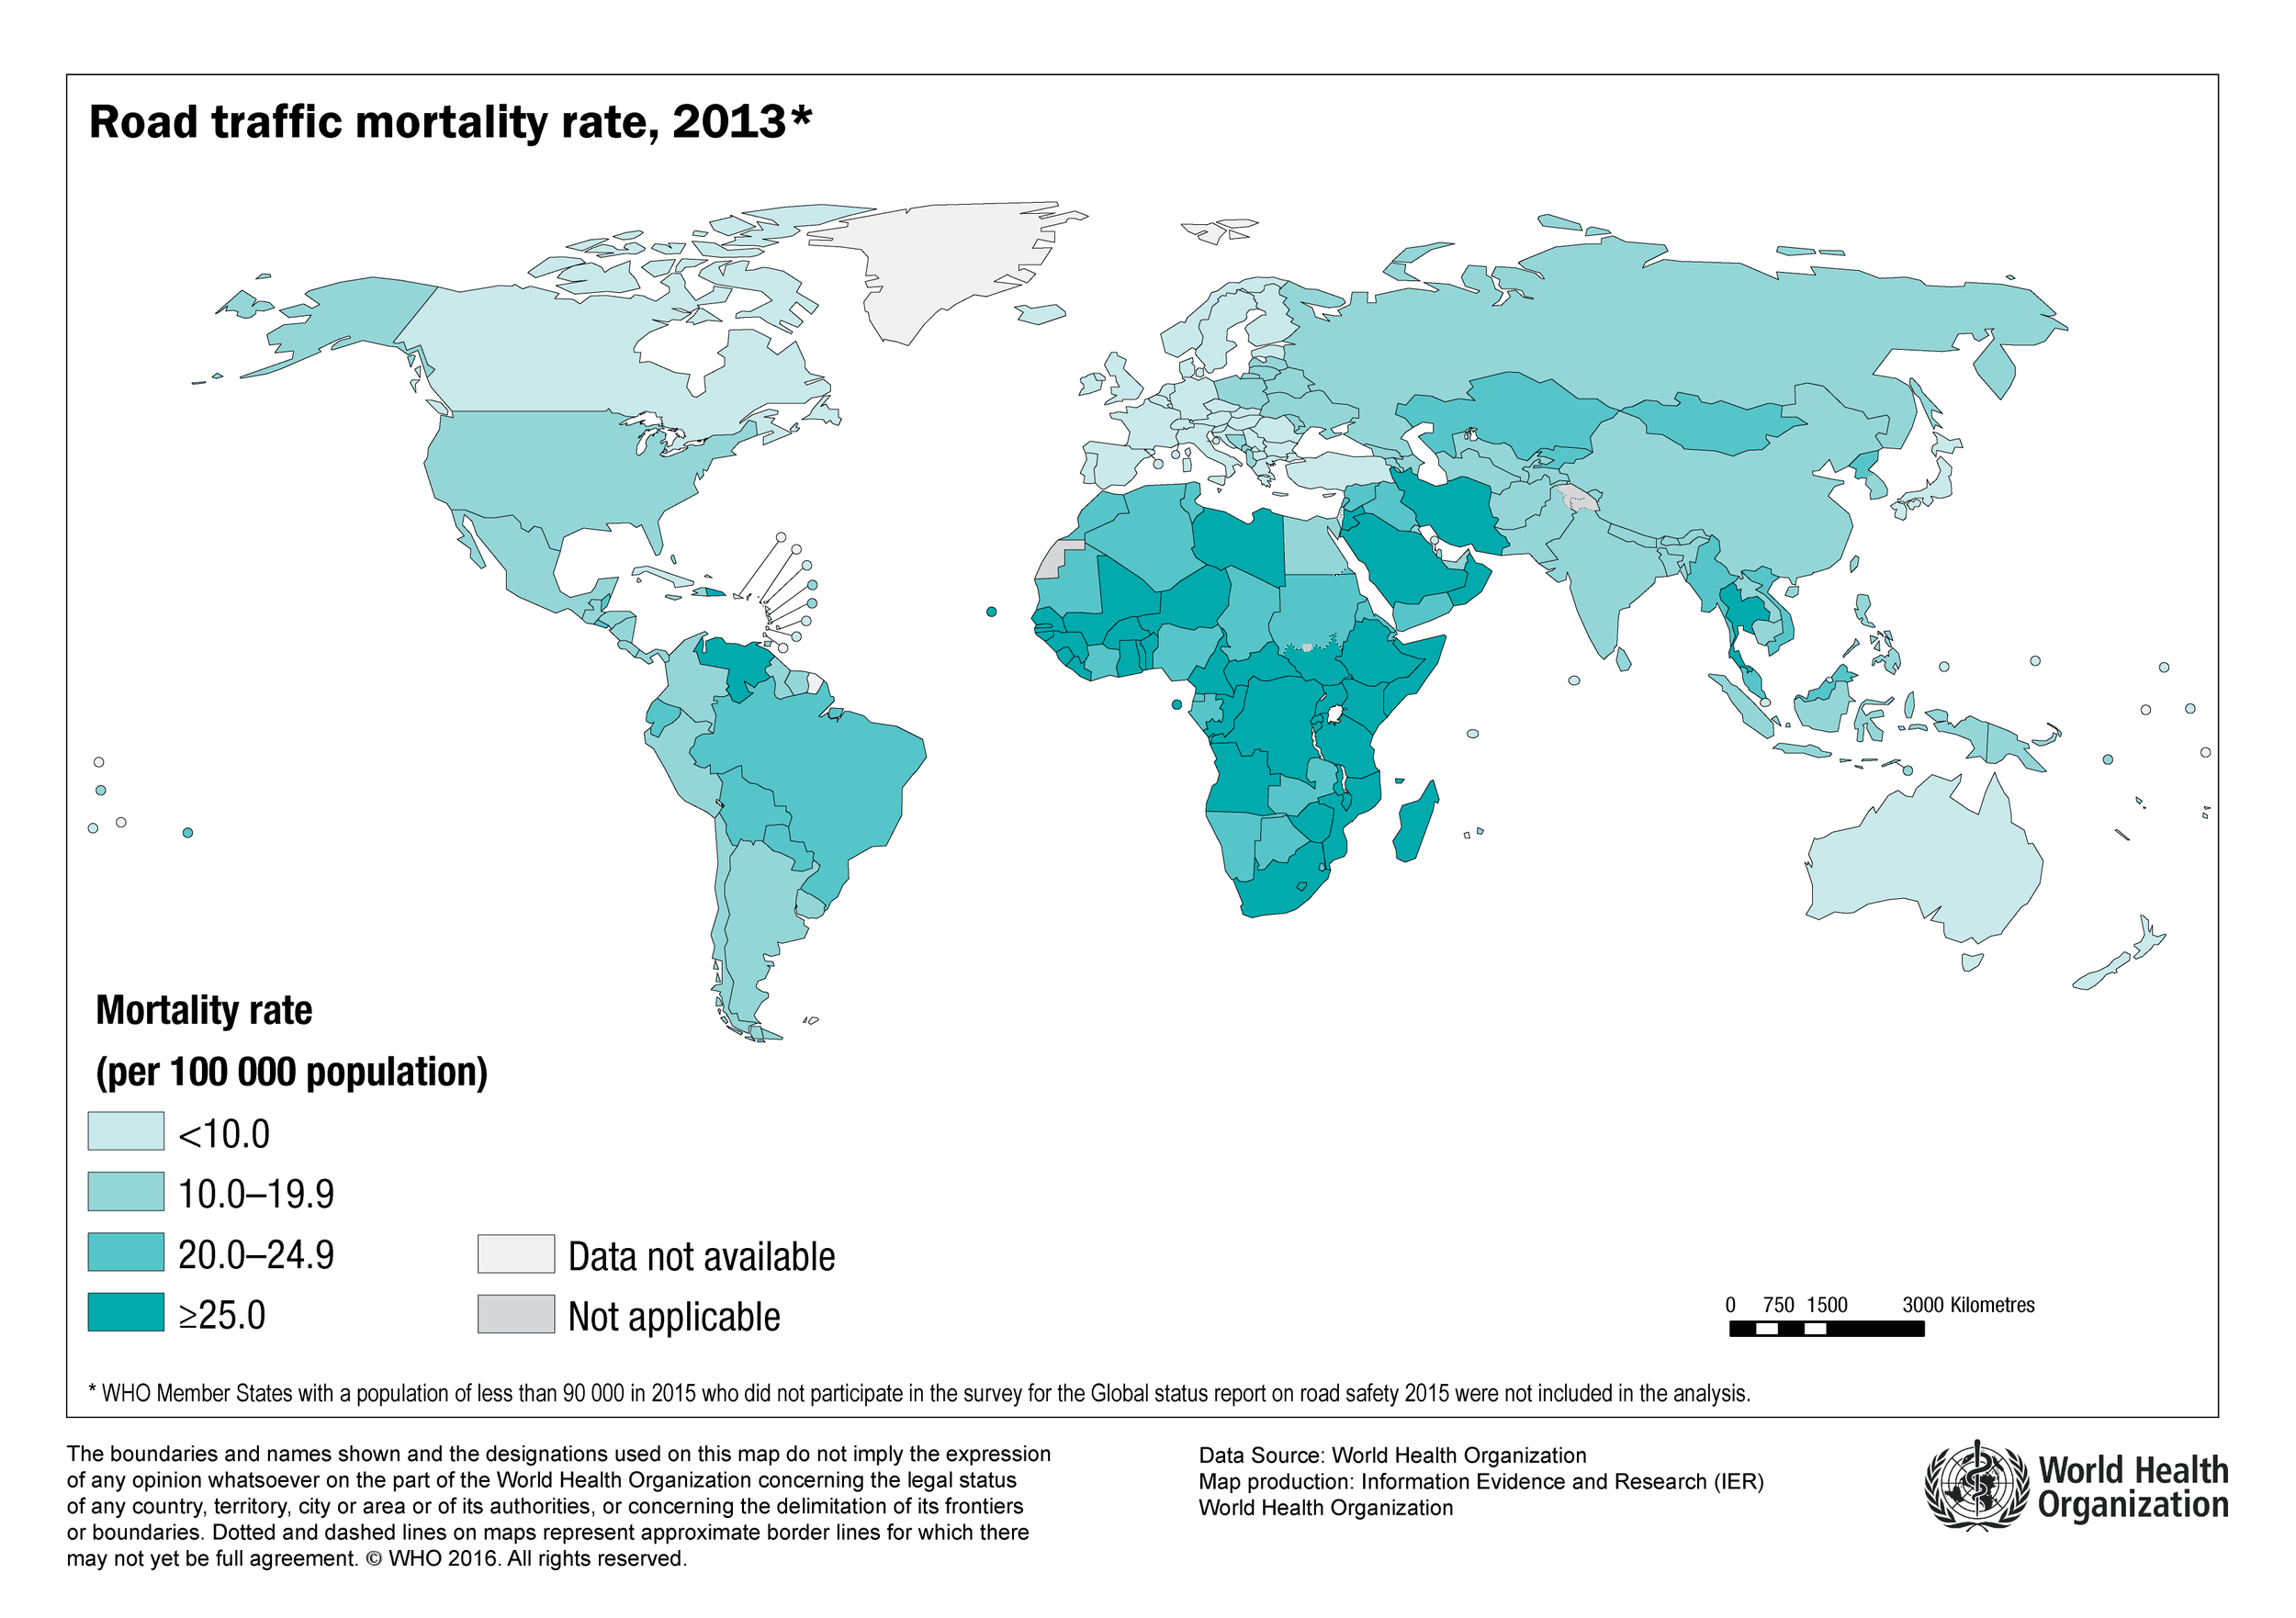 World traffic mortality rate, 2013   Source:  World Health Organization (WHO)